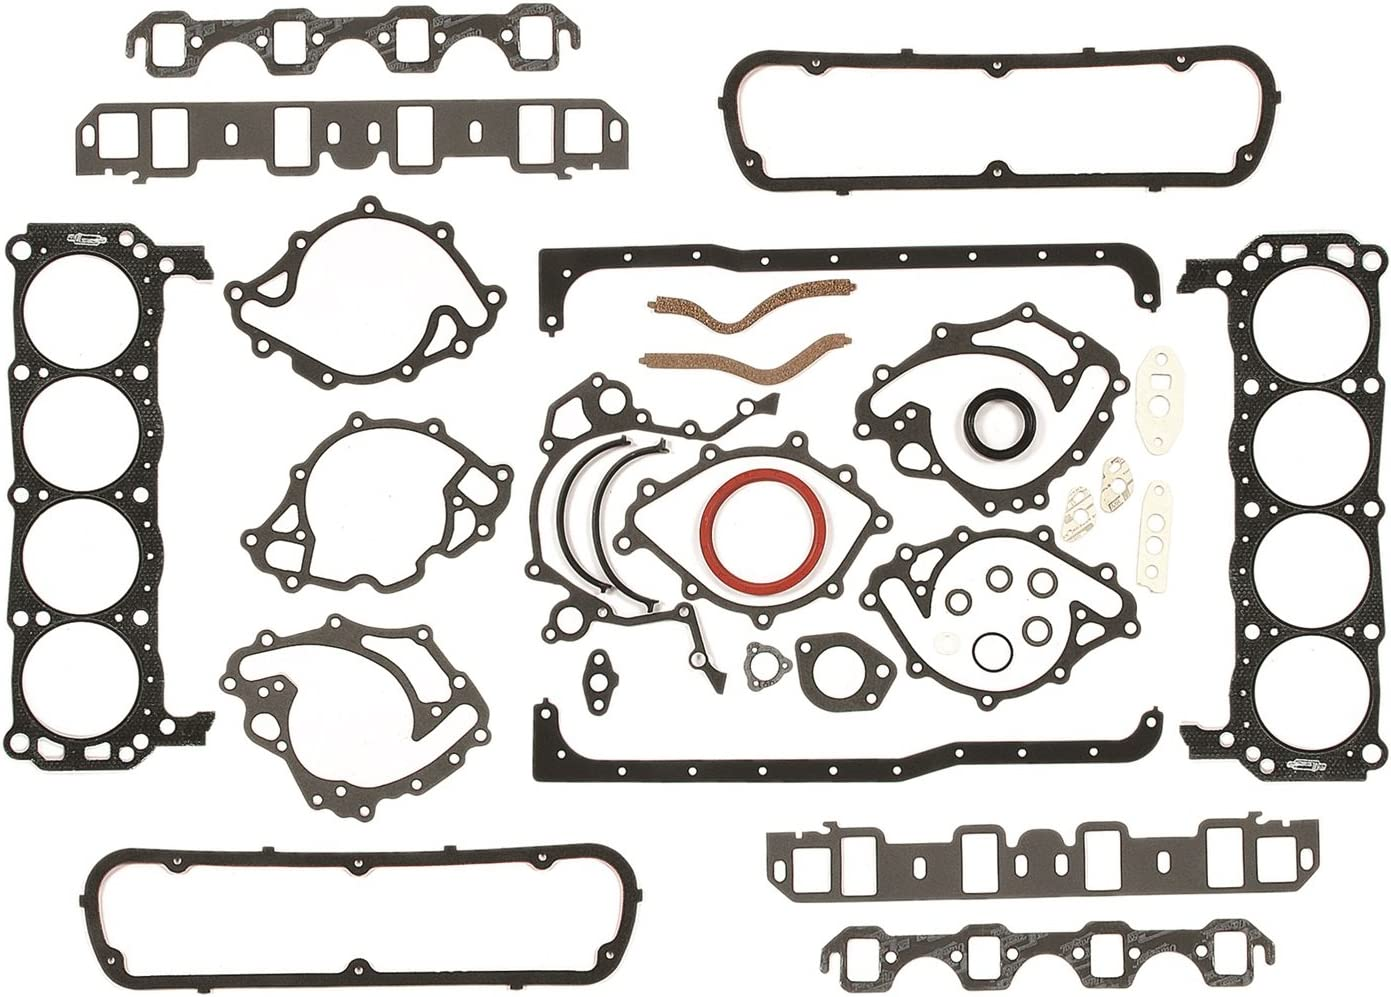 Mr Gasket 5988 Ultra Seal Overhaul Gasket Kit